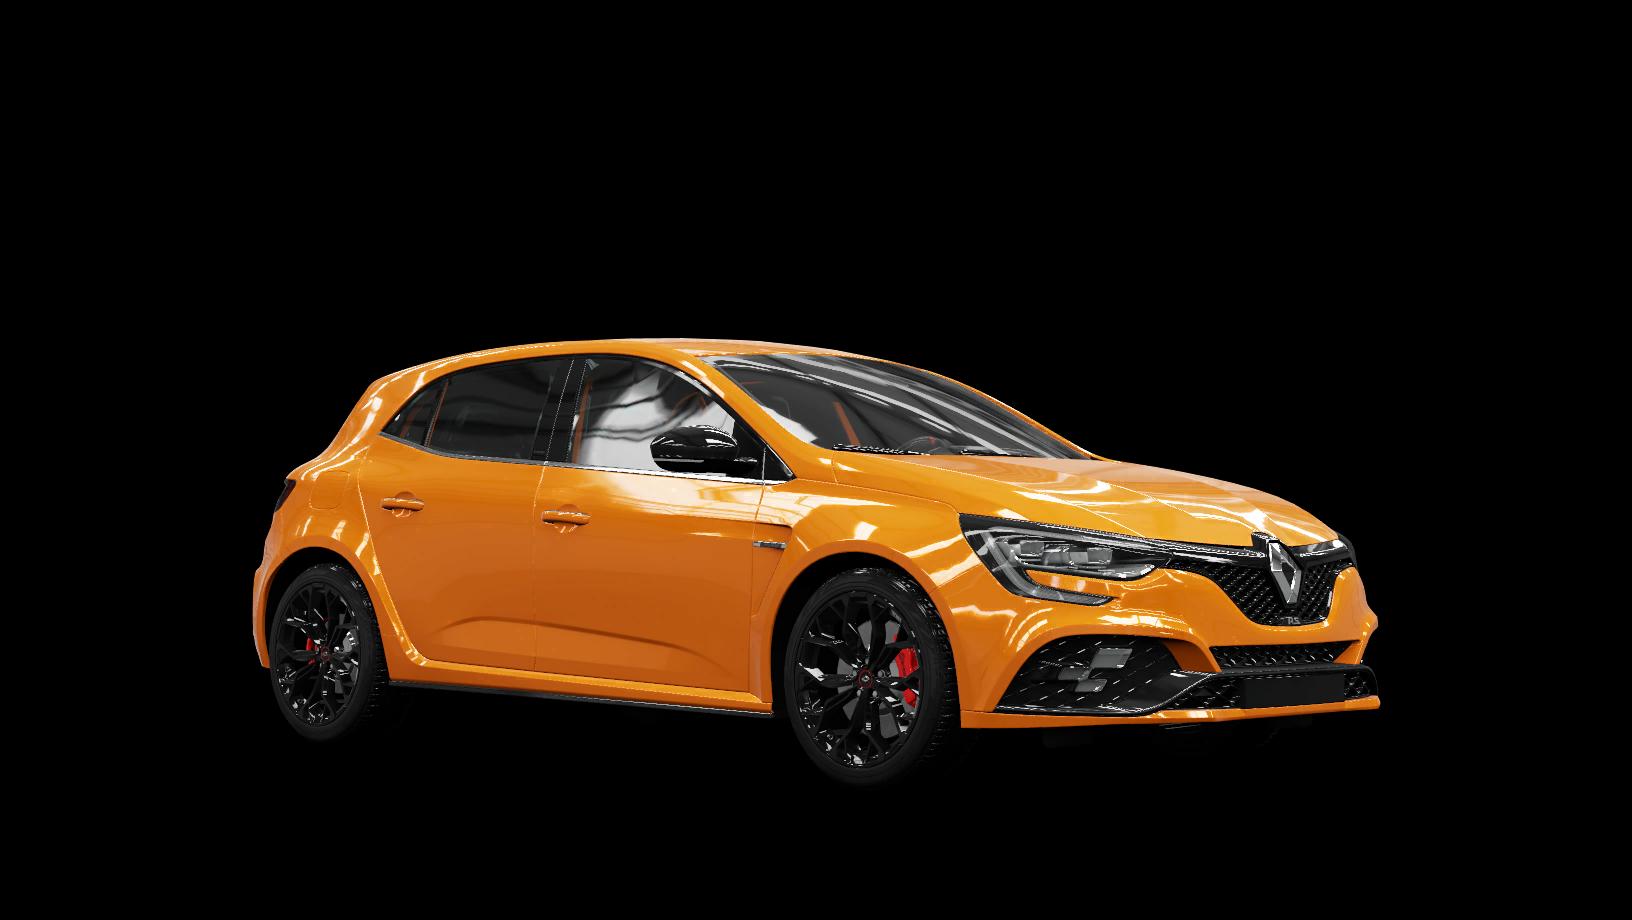 Forza-Horizon-4-Renault-Megane-RS-2018